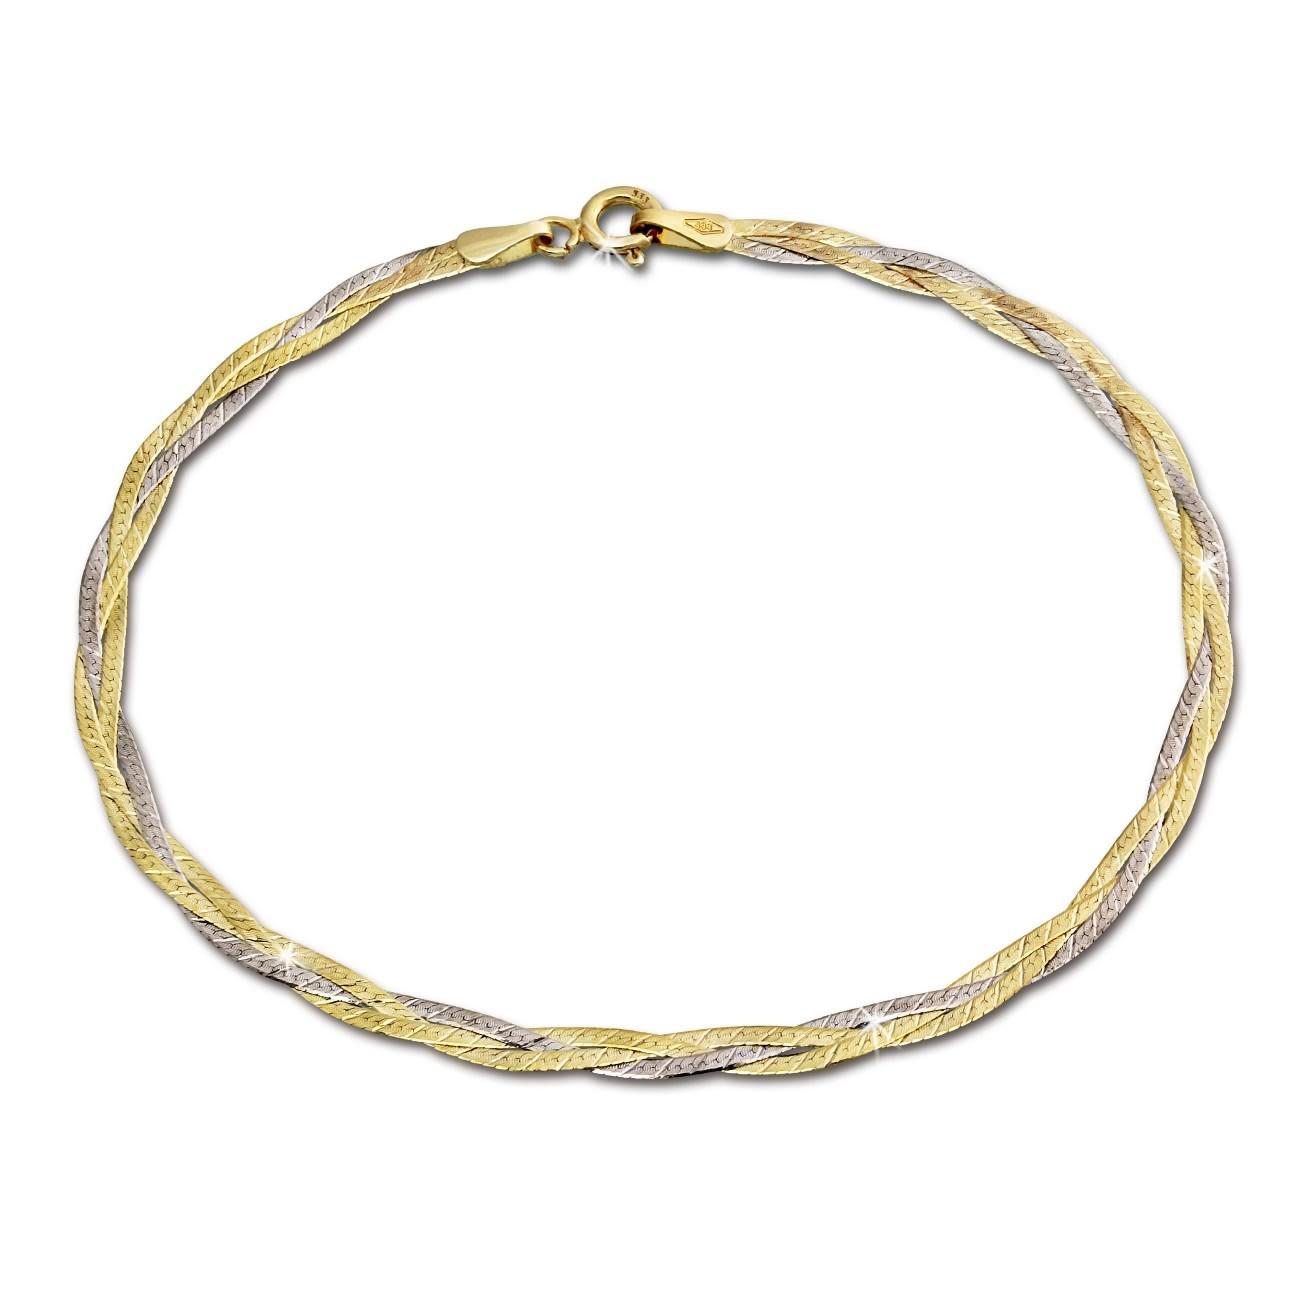 GoldDream Armband Geflochten 333 Gold Damen 19cm 8 Karat GDA0009T